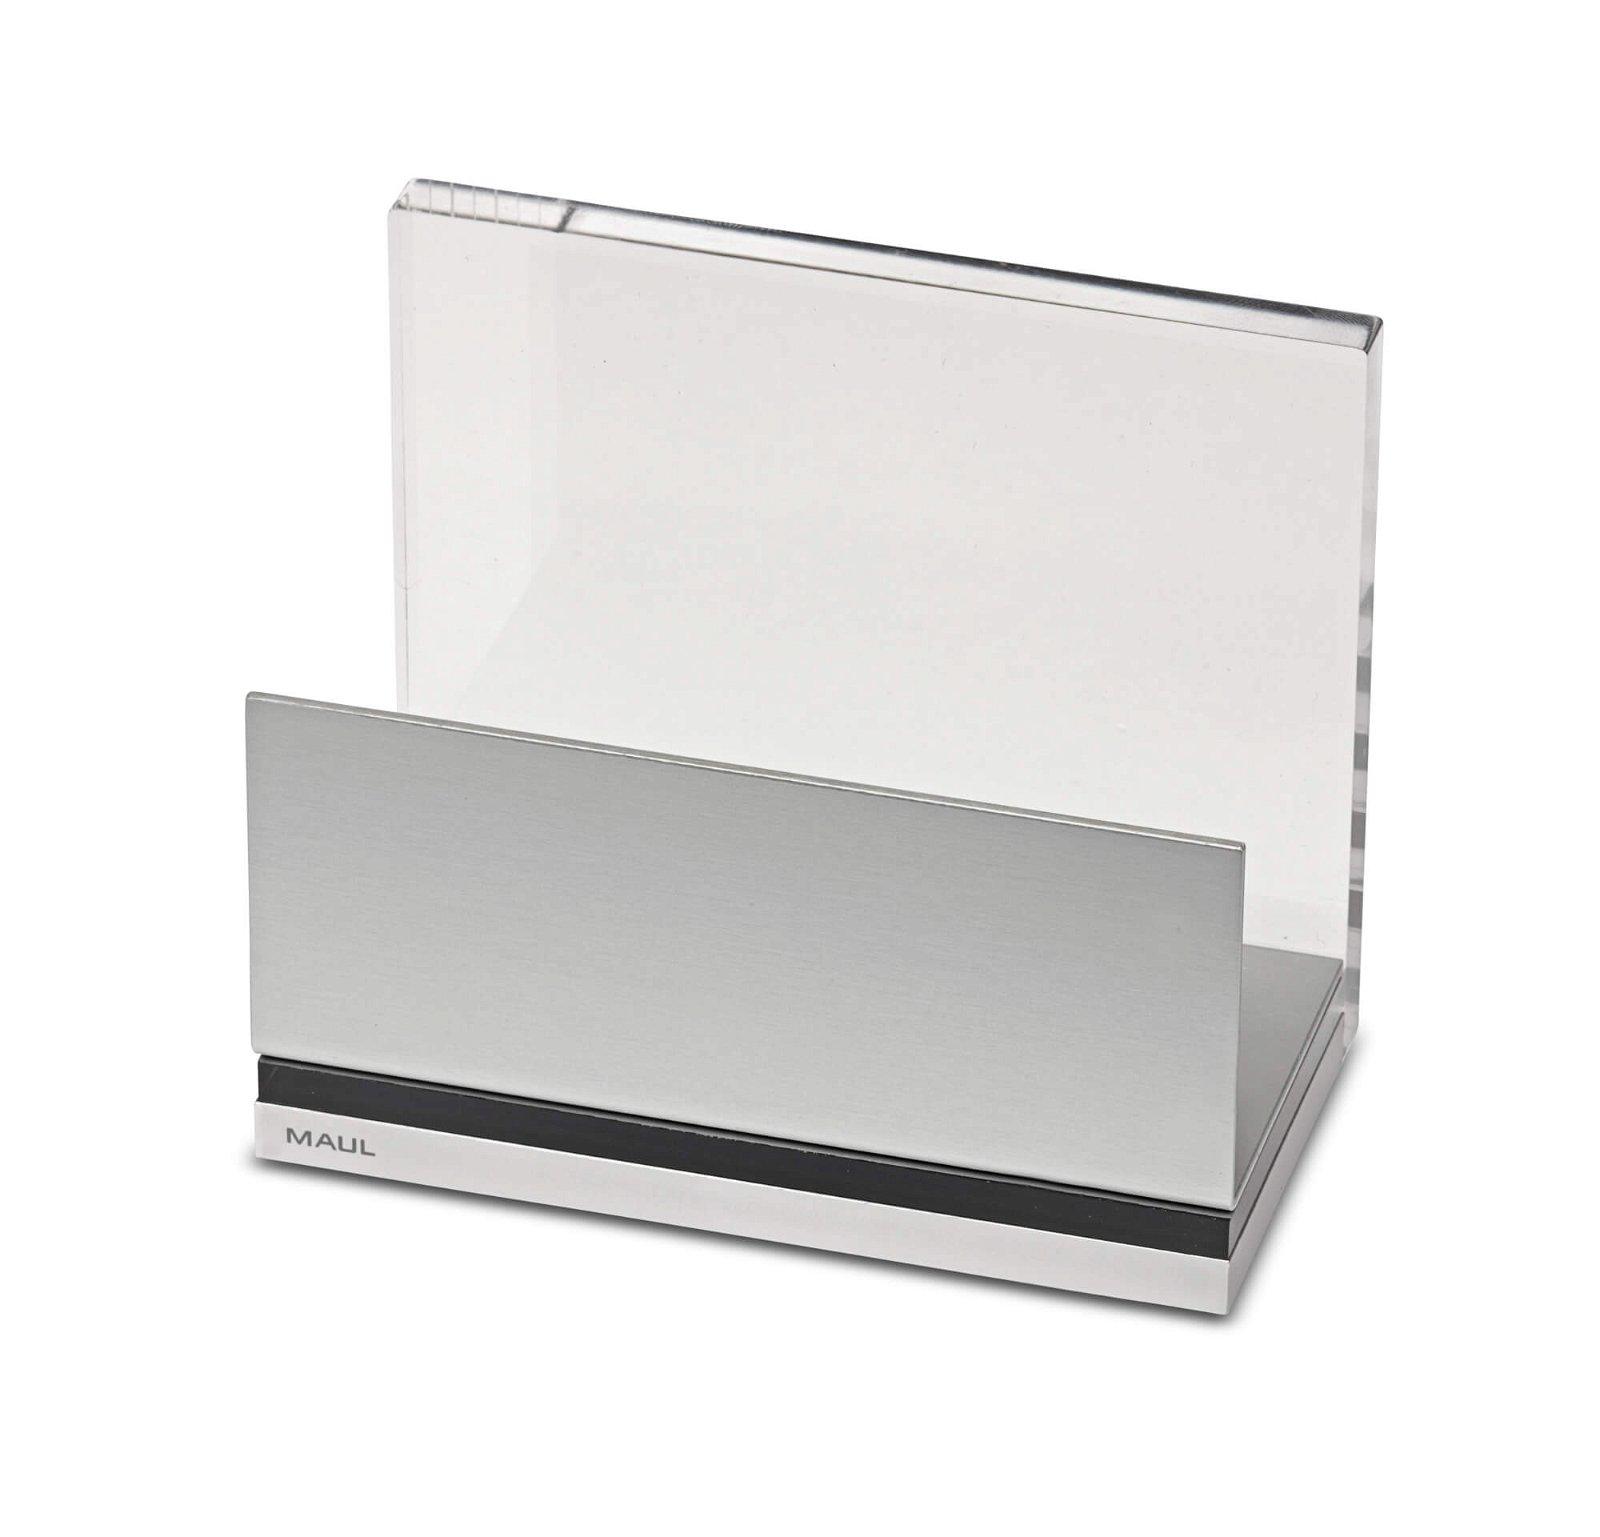 Acryl-Kartenständer MAULacro, glasklar